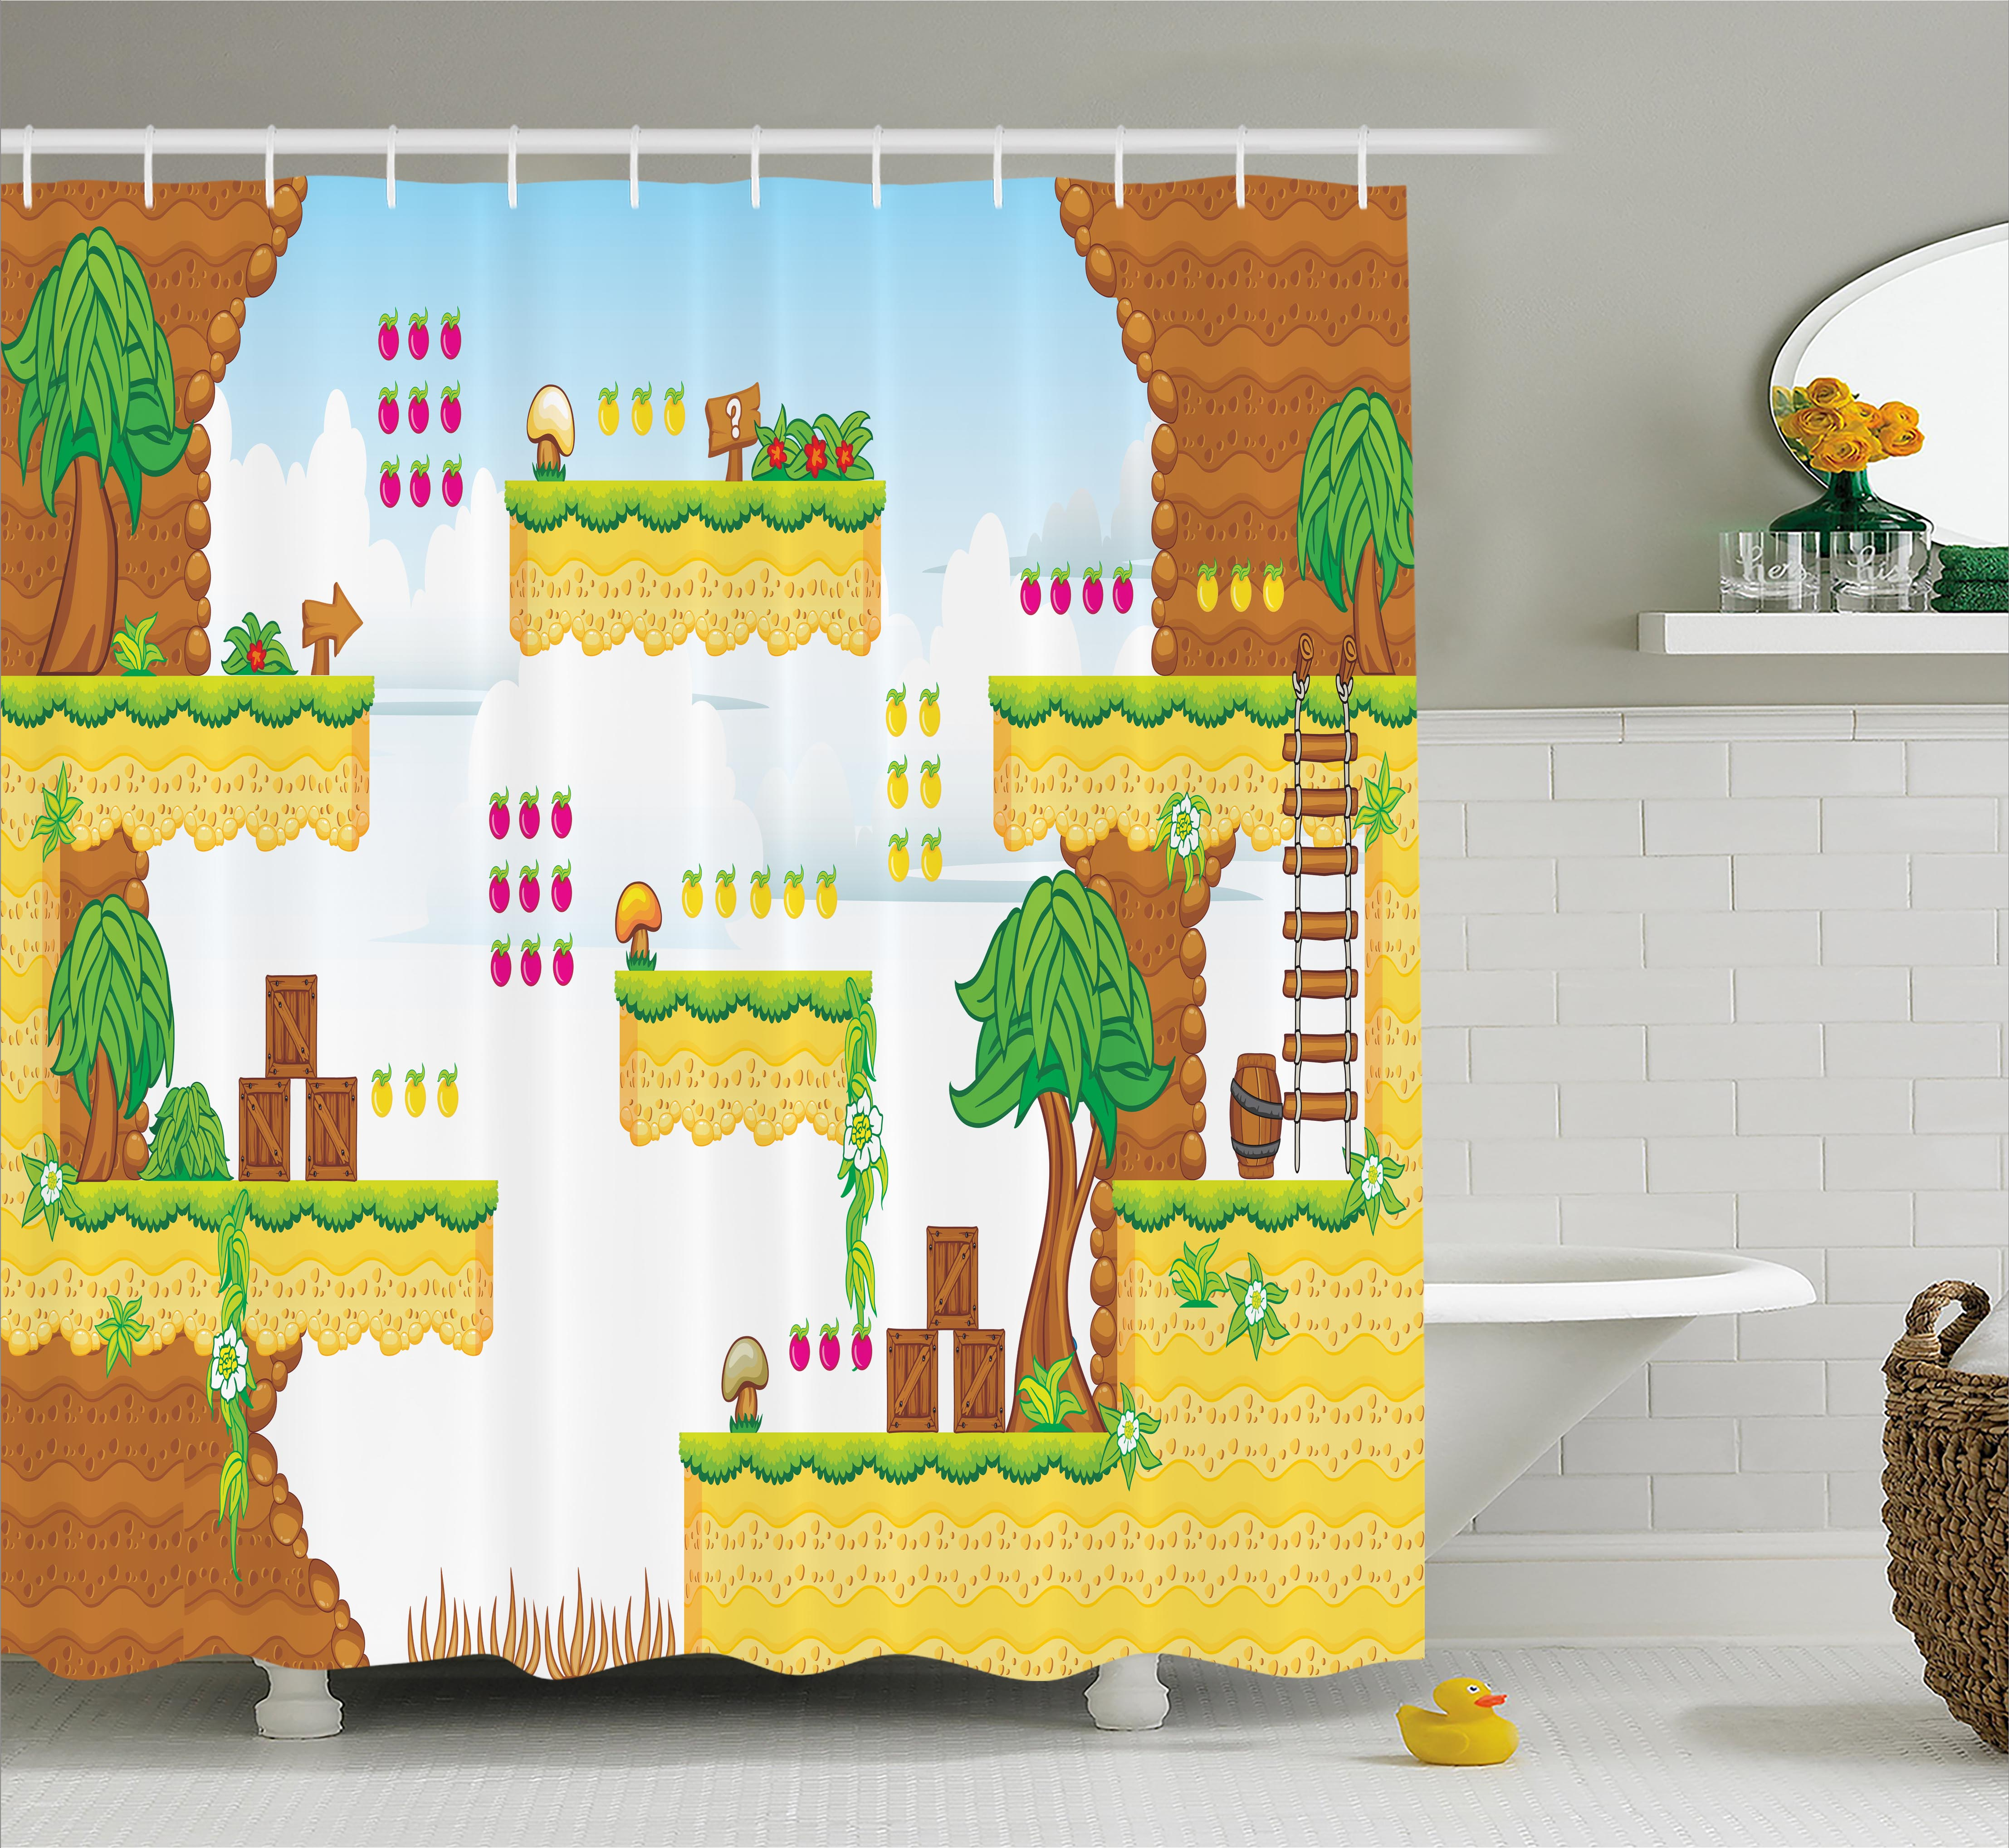 Video Games Shower Curtain, Cartoon Retro Computer Graphic Kids Western  Design Box Cloud Fun Adventure 90's, Fabric Bathroom Set with Hooks, 69W X  70L